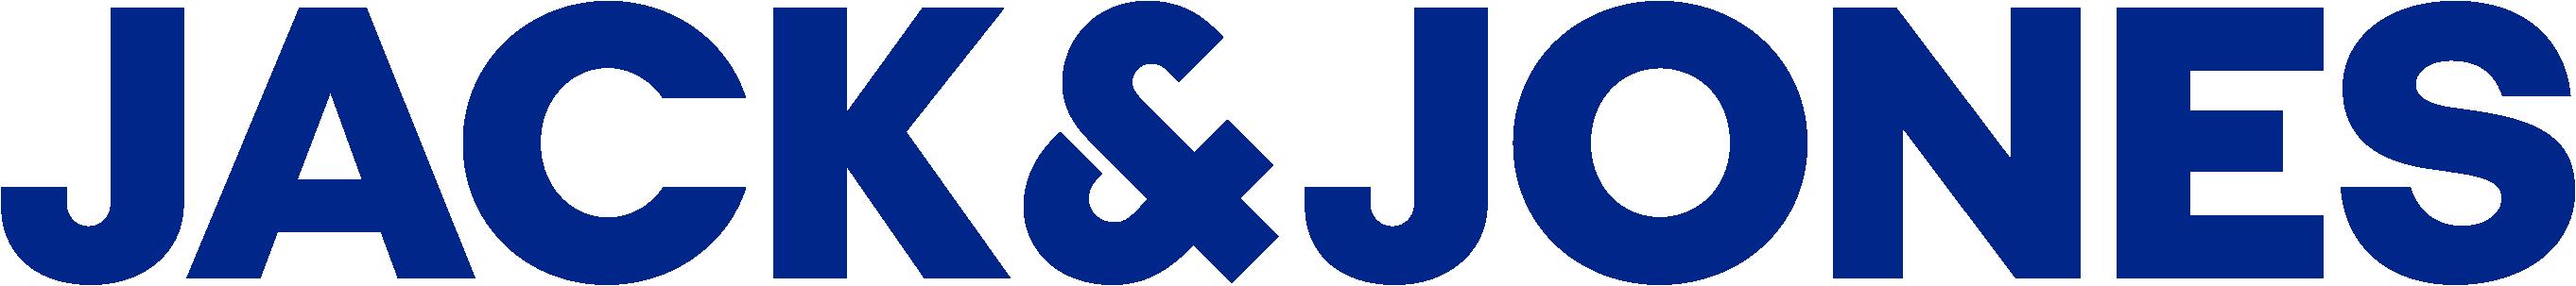 Jack and jones logo clipart clip art black and white Jack & Jones - Ülemiste keskus clip art black and white